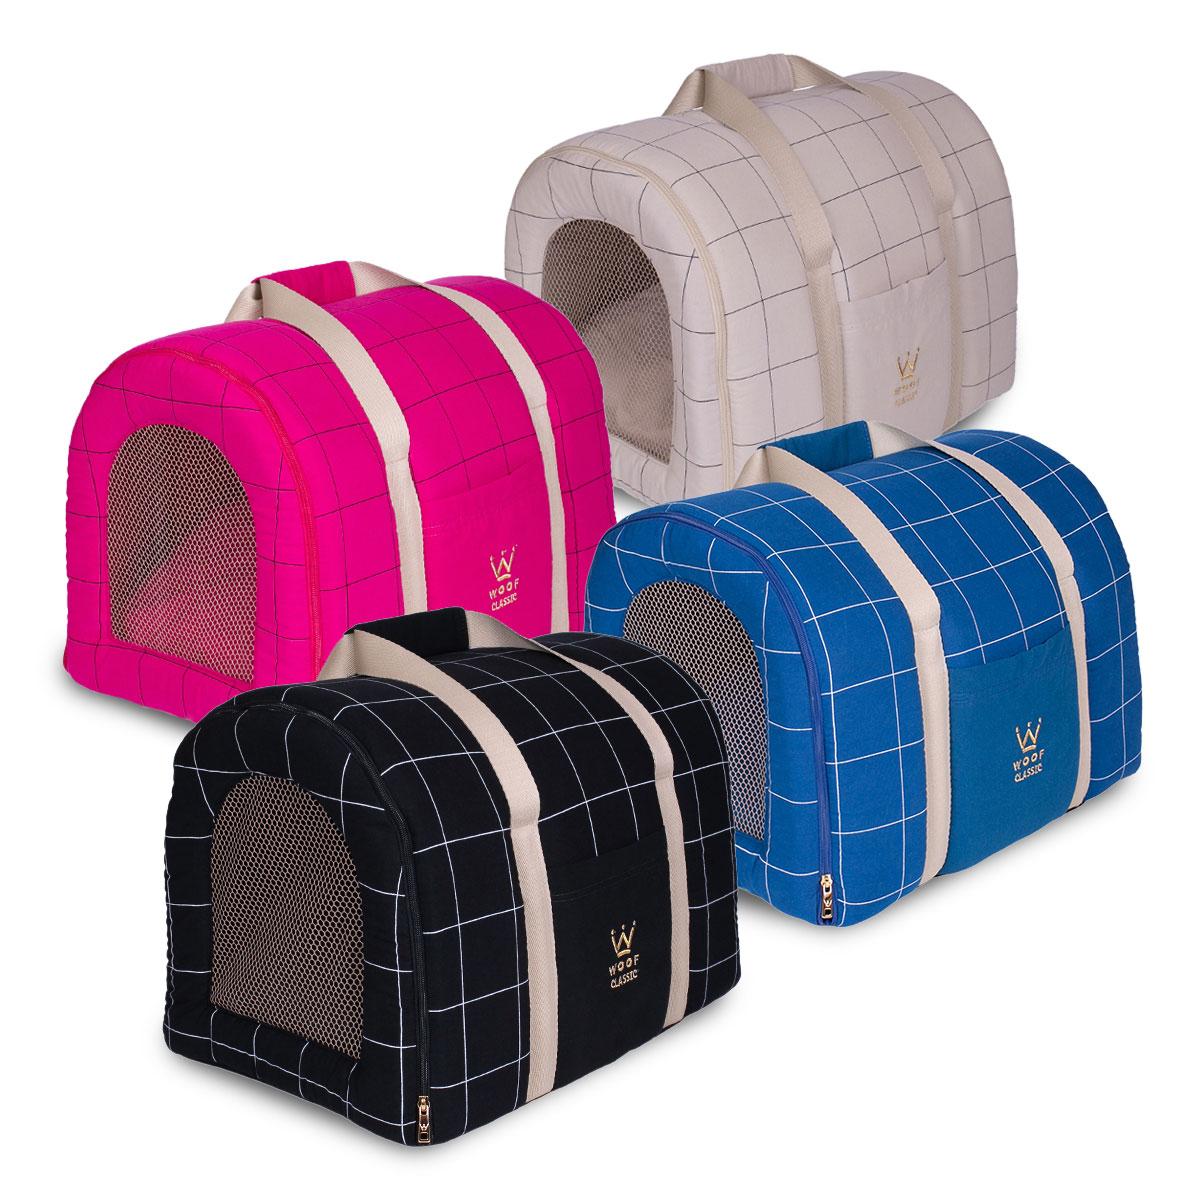 Bolsa de Transporte Tela Lazzy Grid Woof Classic